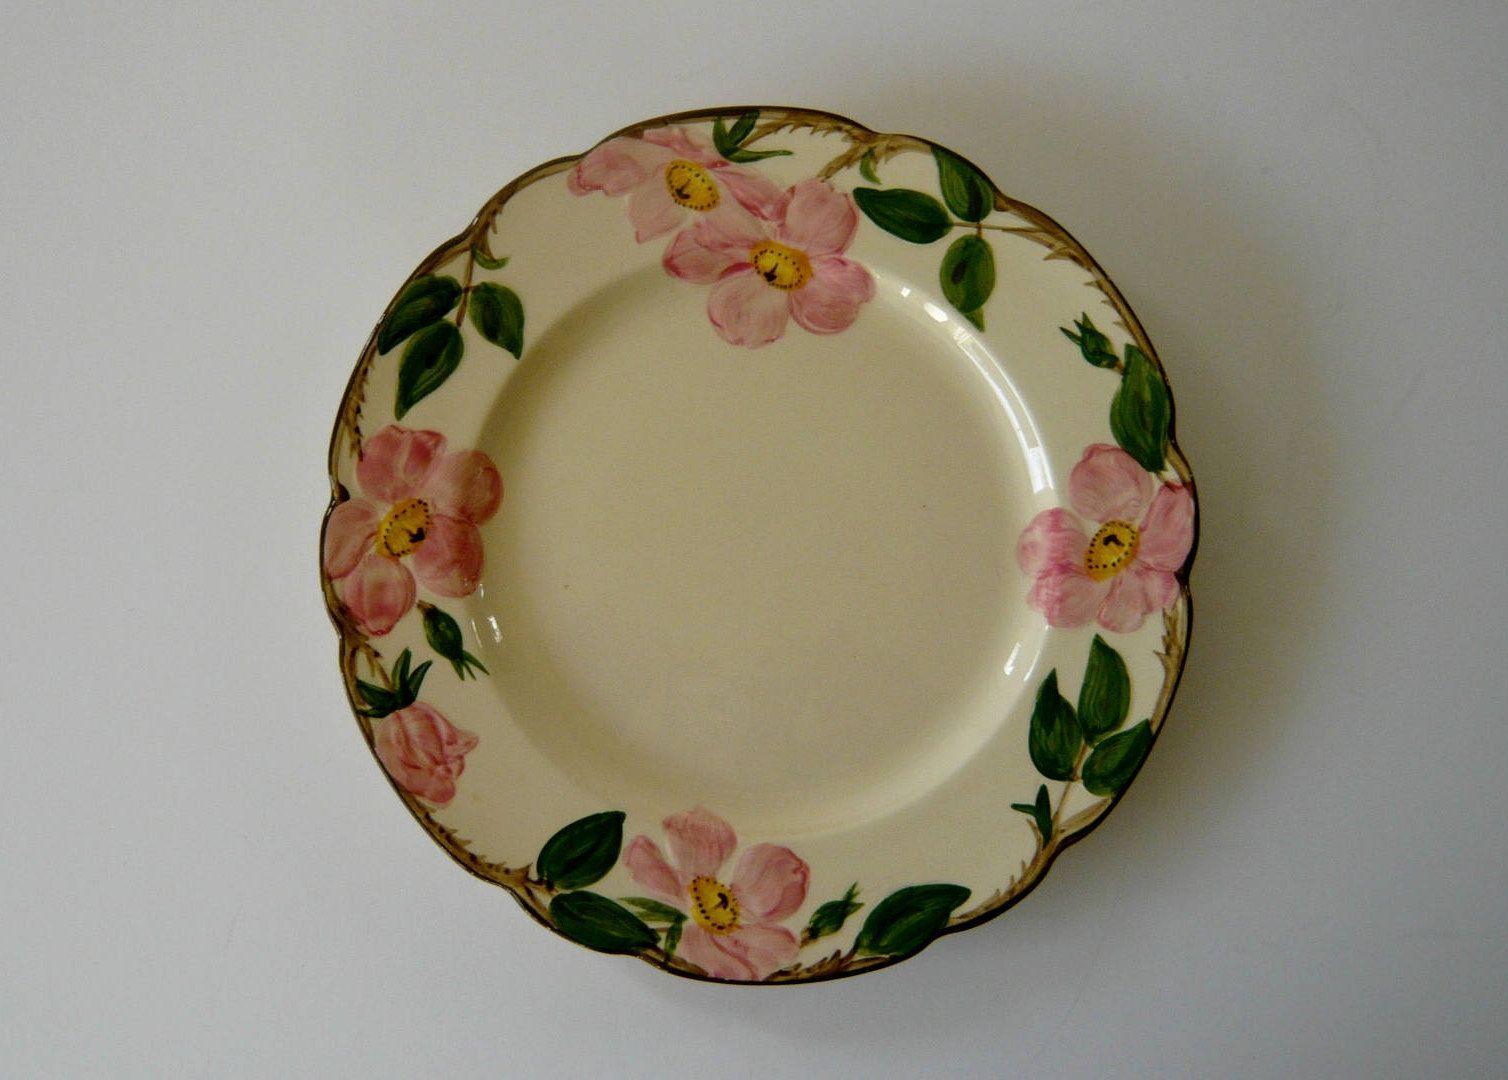 Franciscan Desert Rose Bread Plate Or Dessert Plate Six Inch Diameter With Images Franciscan Desert Rose Plates Dinnerware Patterns